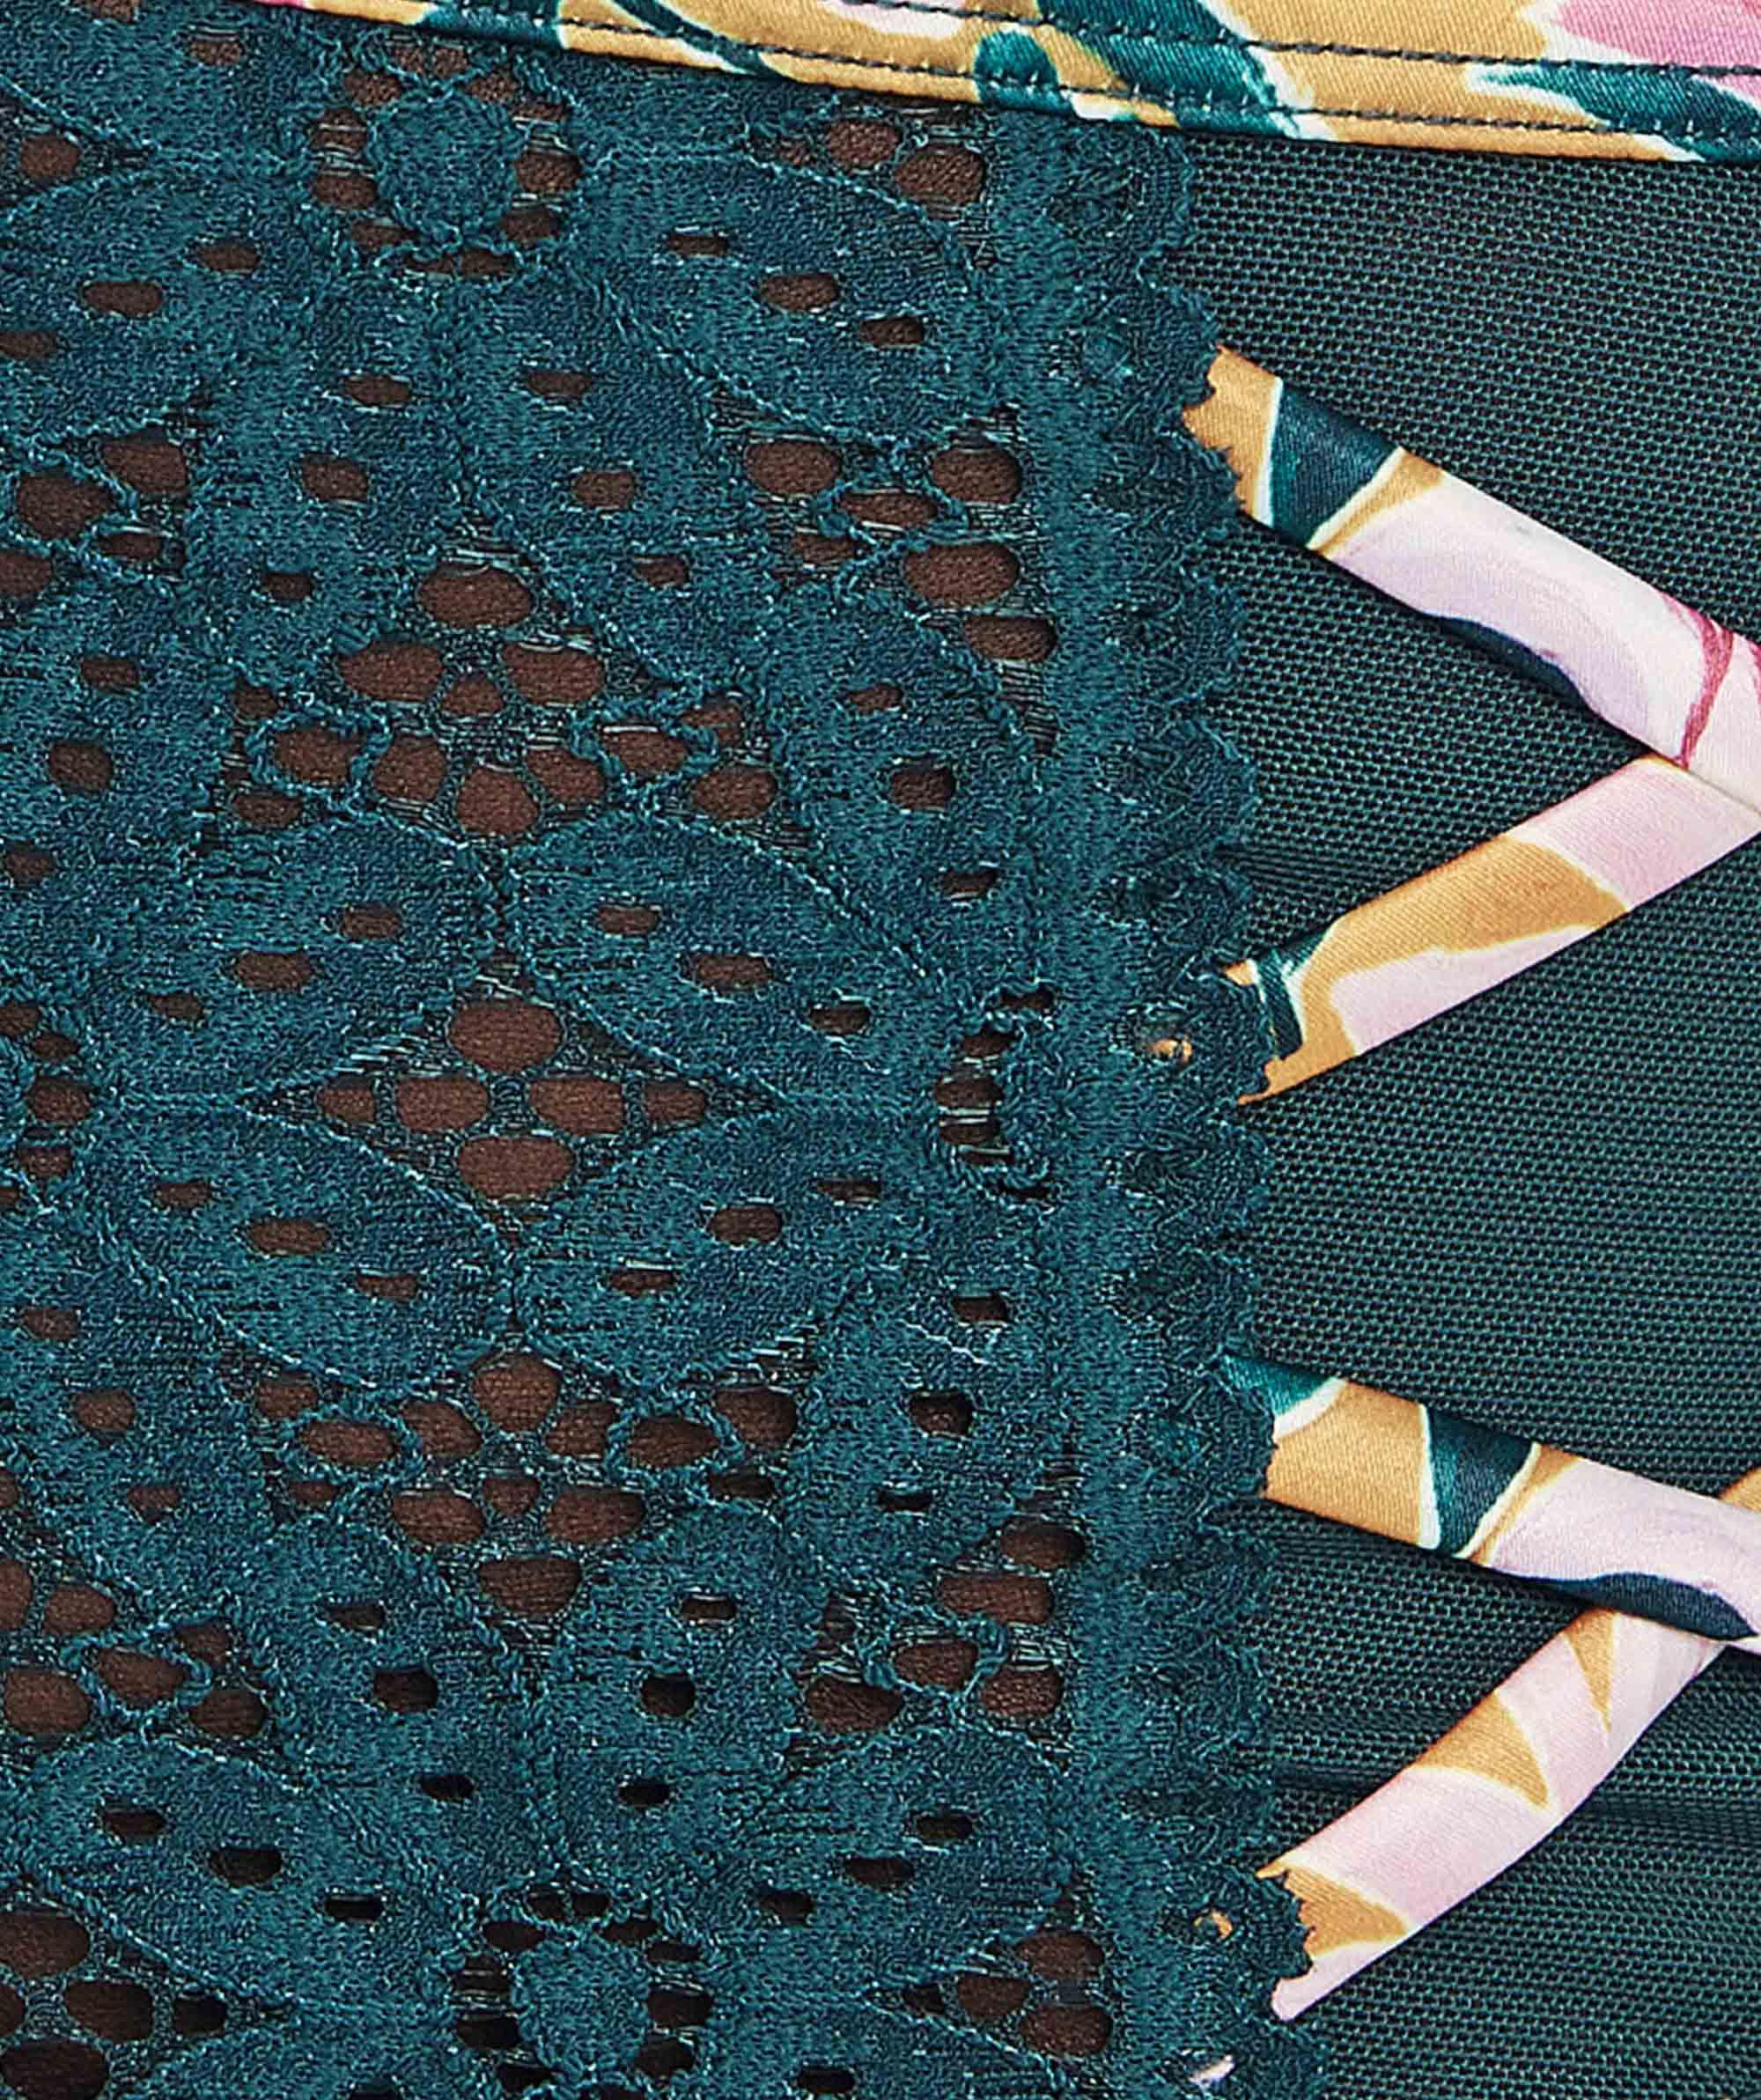 Saint Tropez High Waisted V-String Knicker - Teal/Floral Print